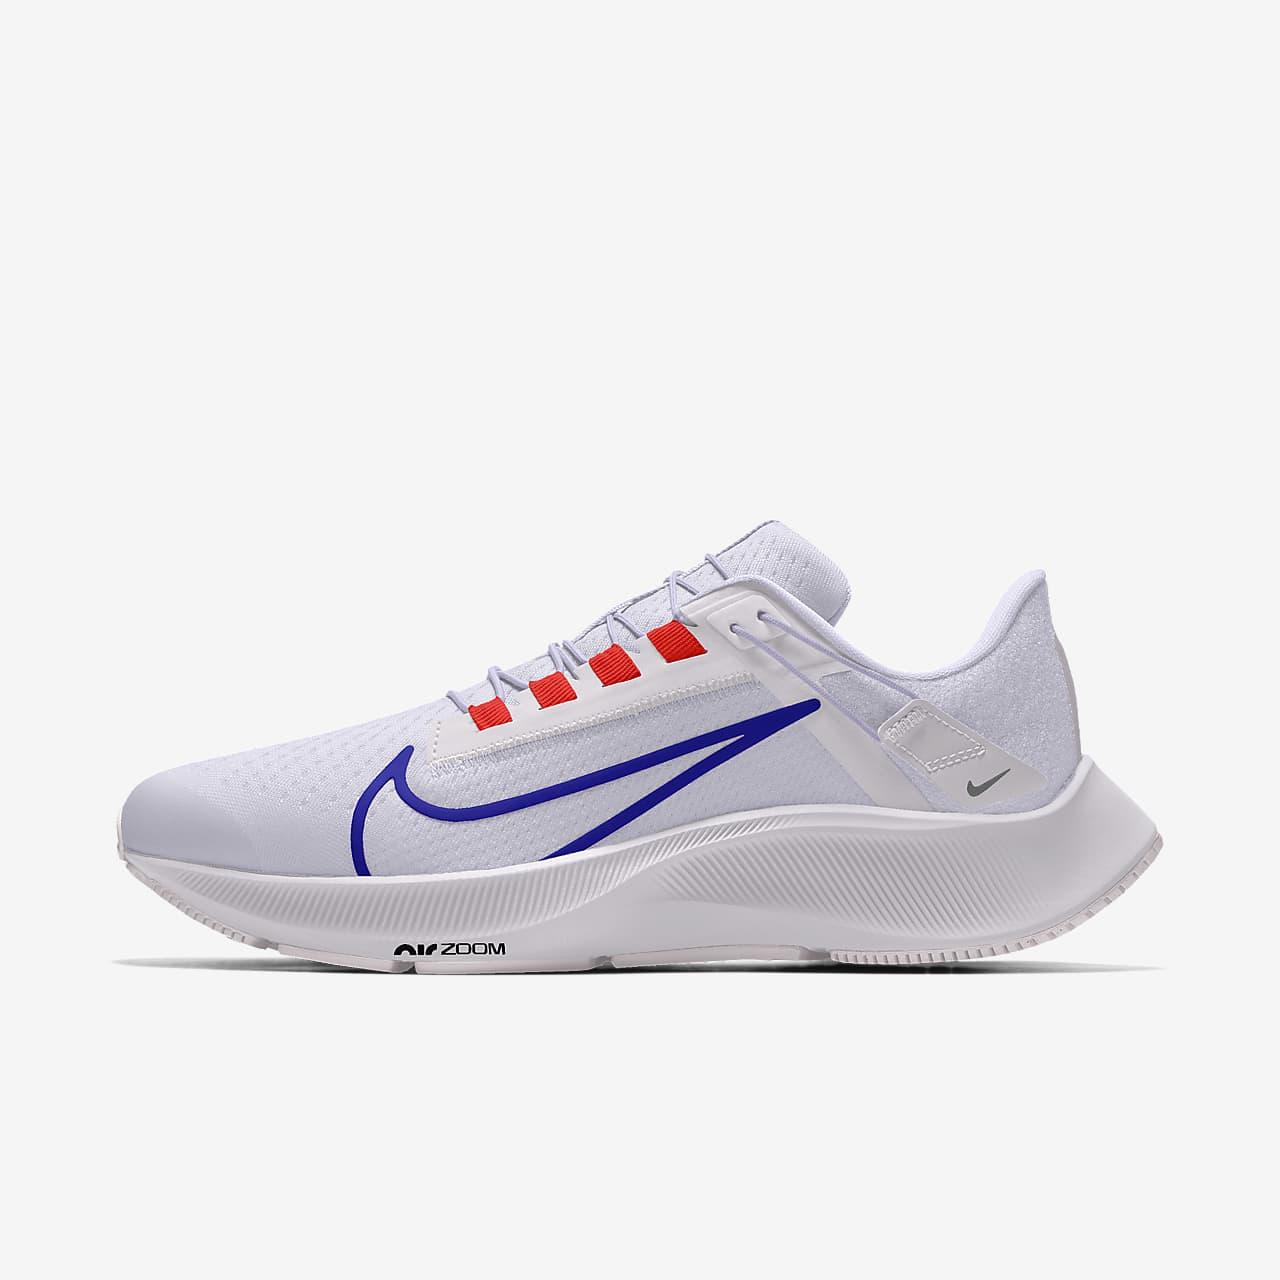 Nike Air Zoom Pegasus 38 By You Men's Road Running Shoes